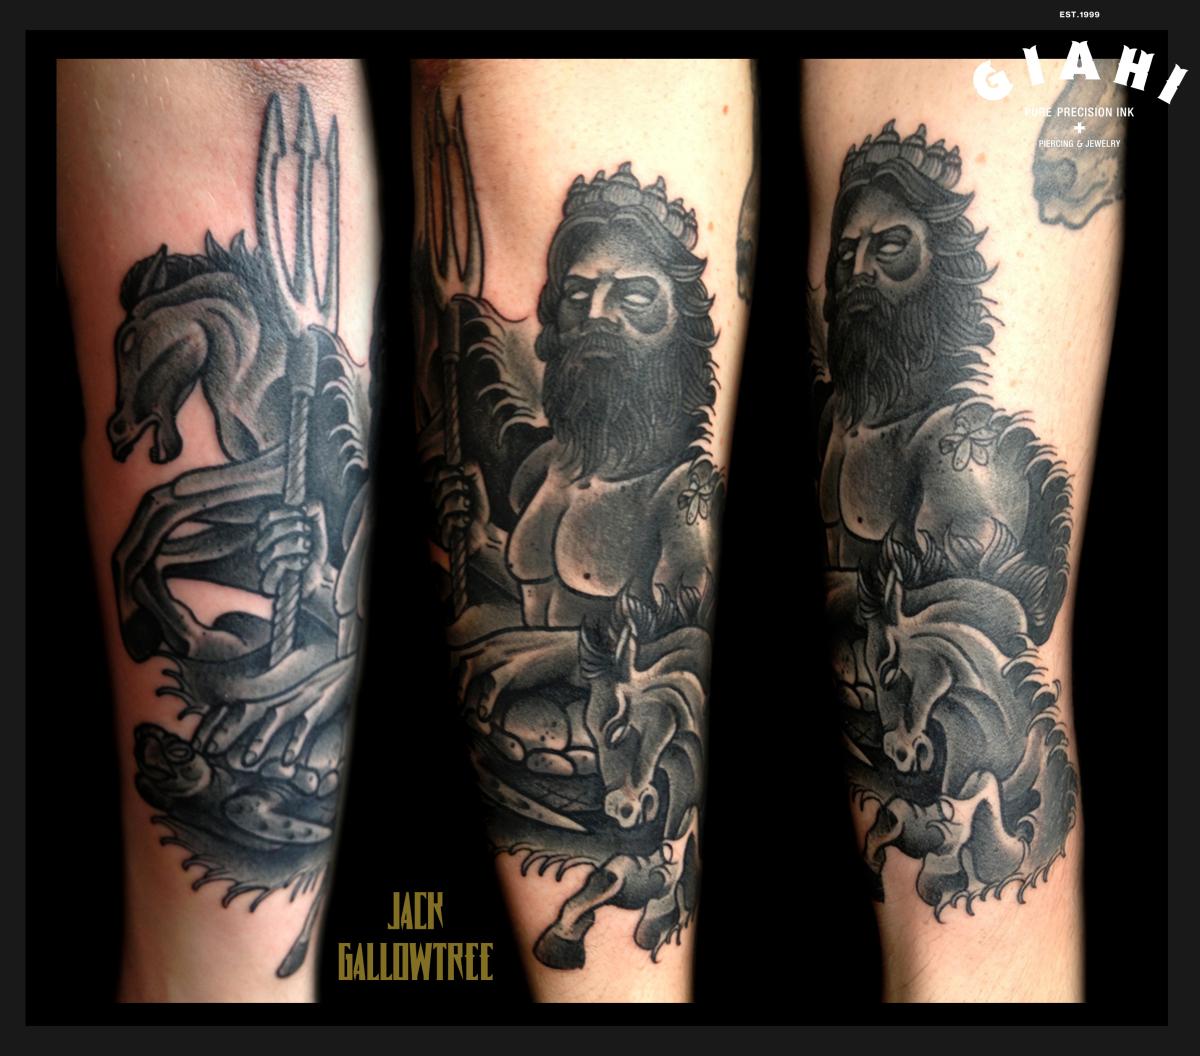 Blackwork Neptune tattoo by Jack Gallowtree